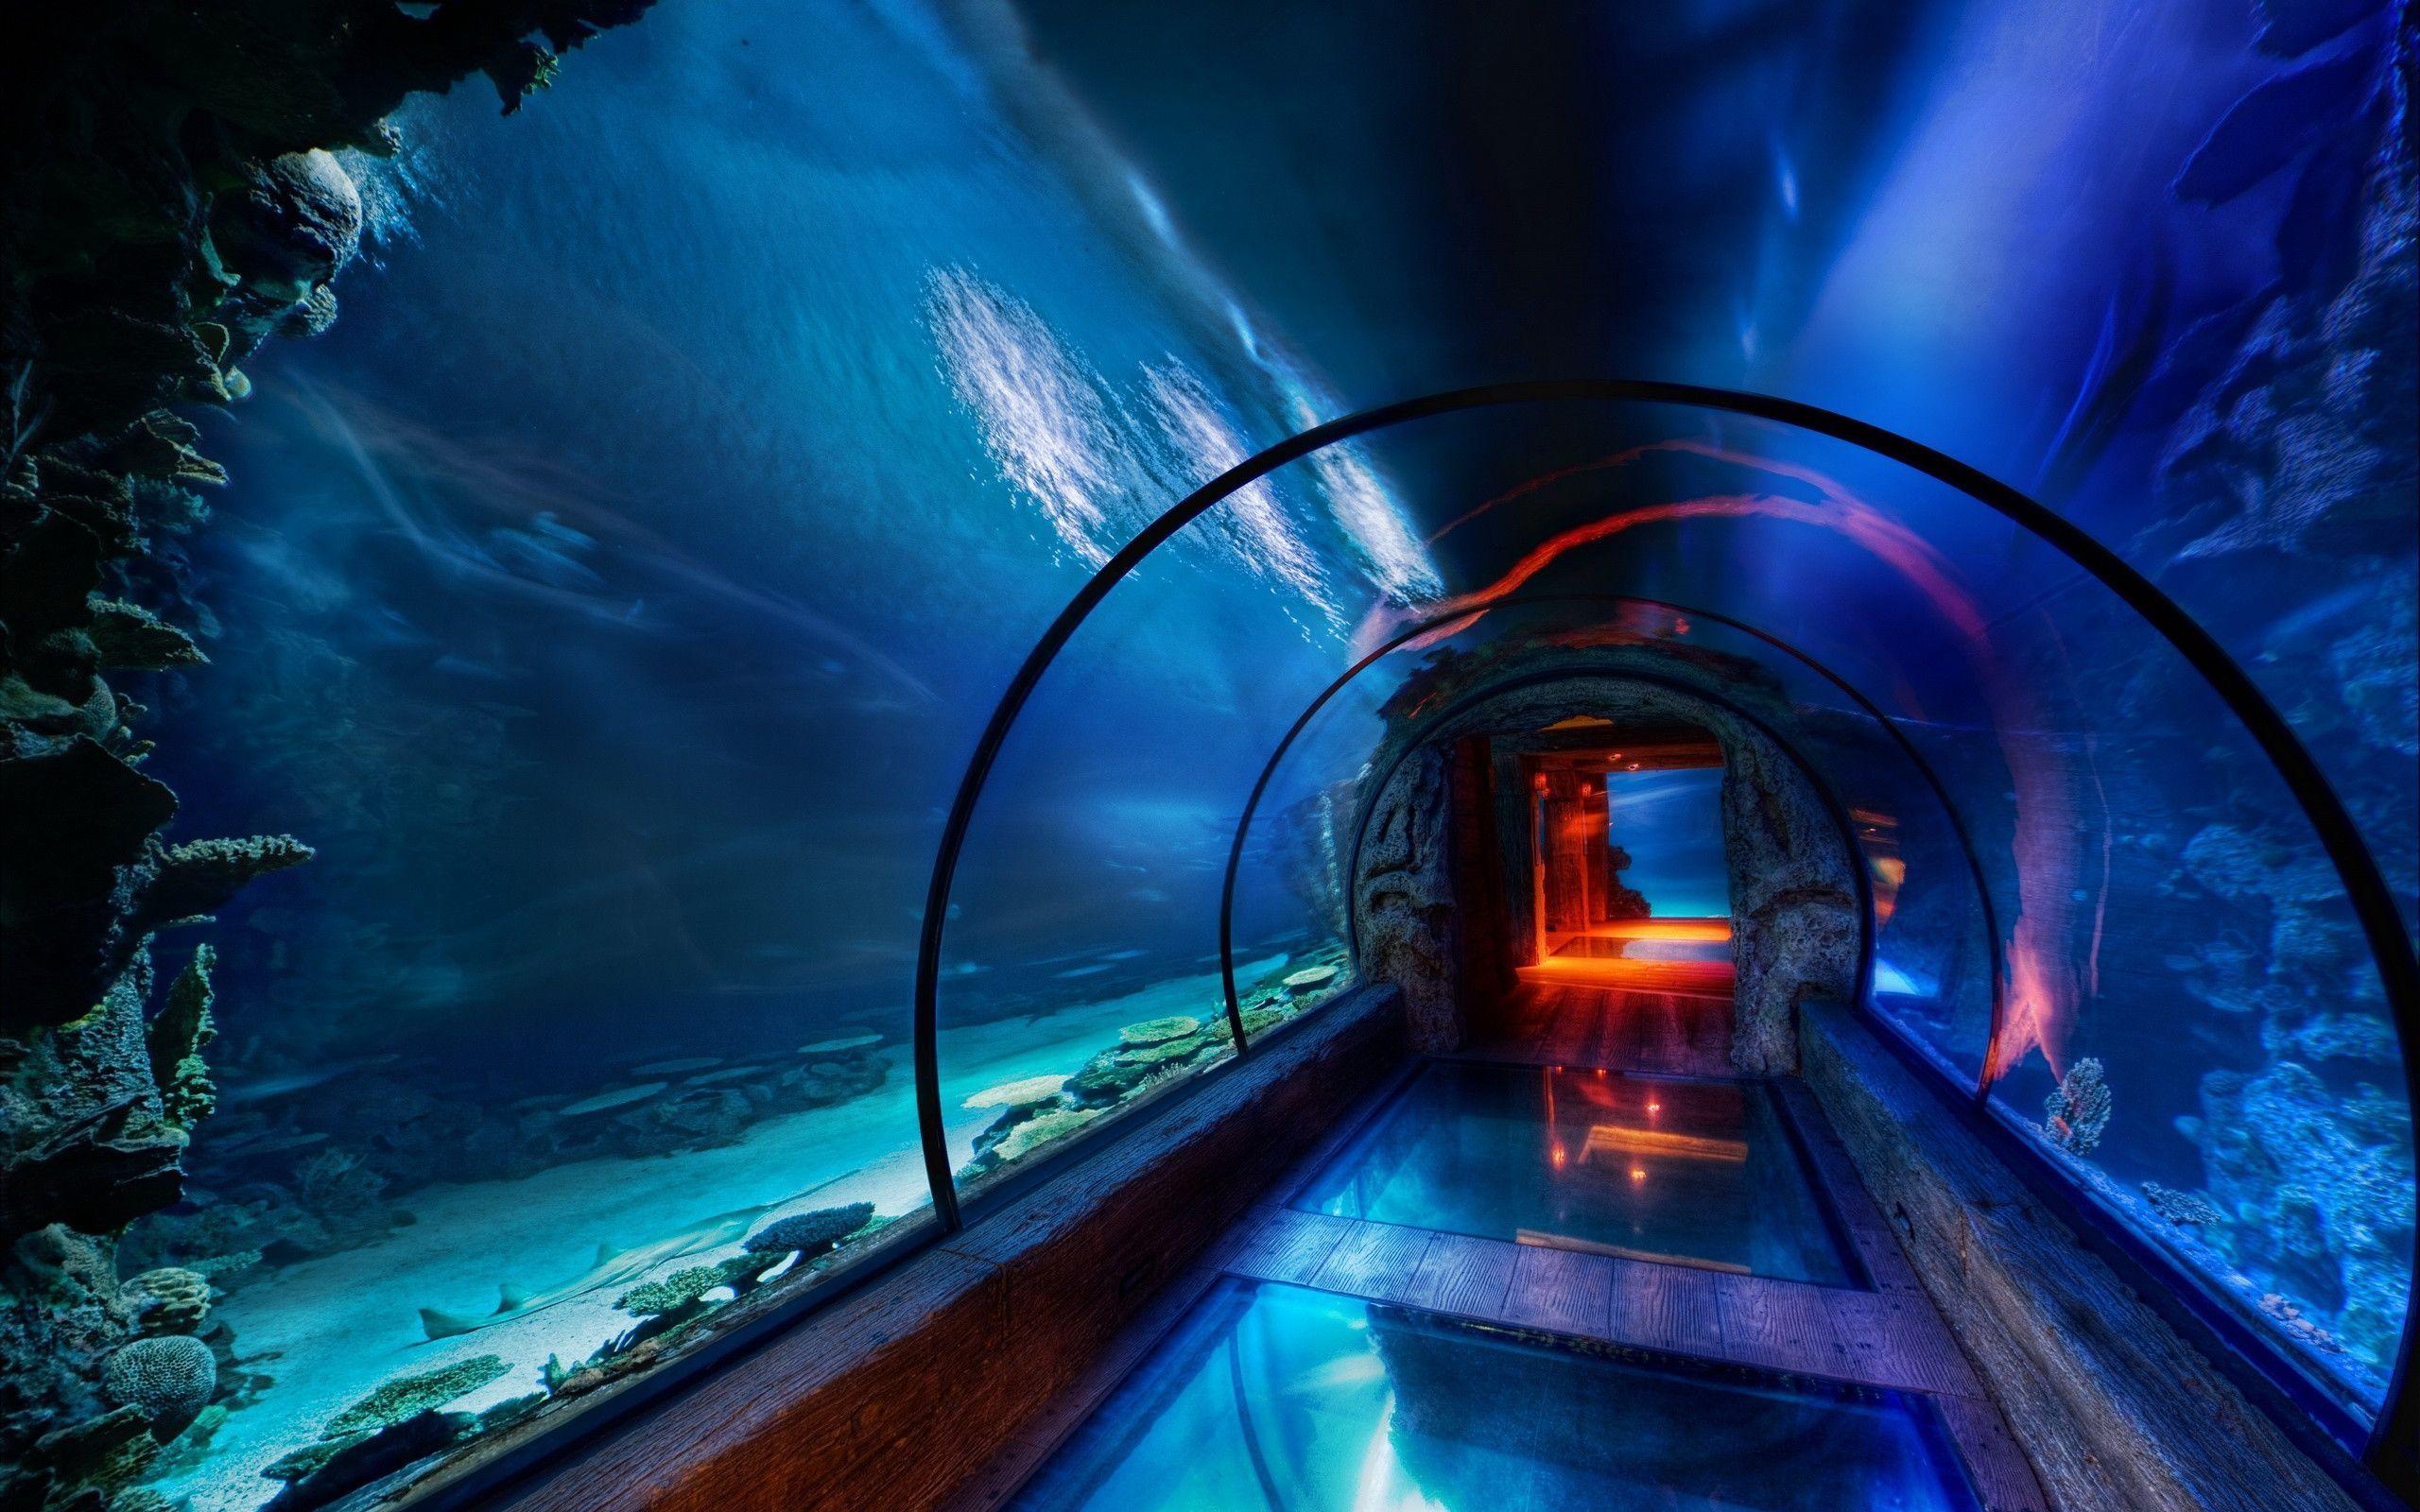 under water wallpaper 09 2560x1600